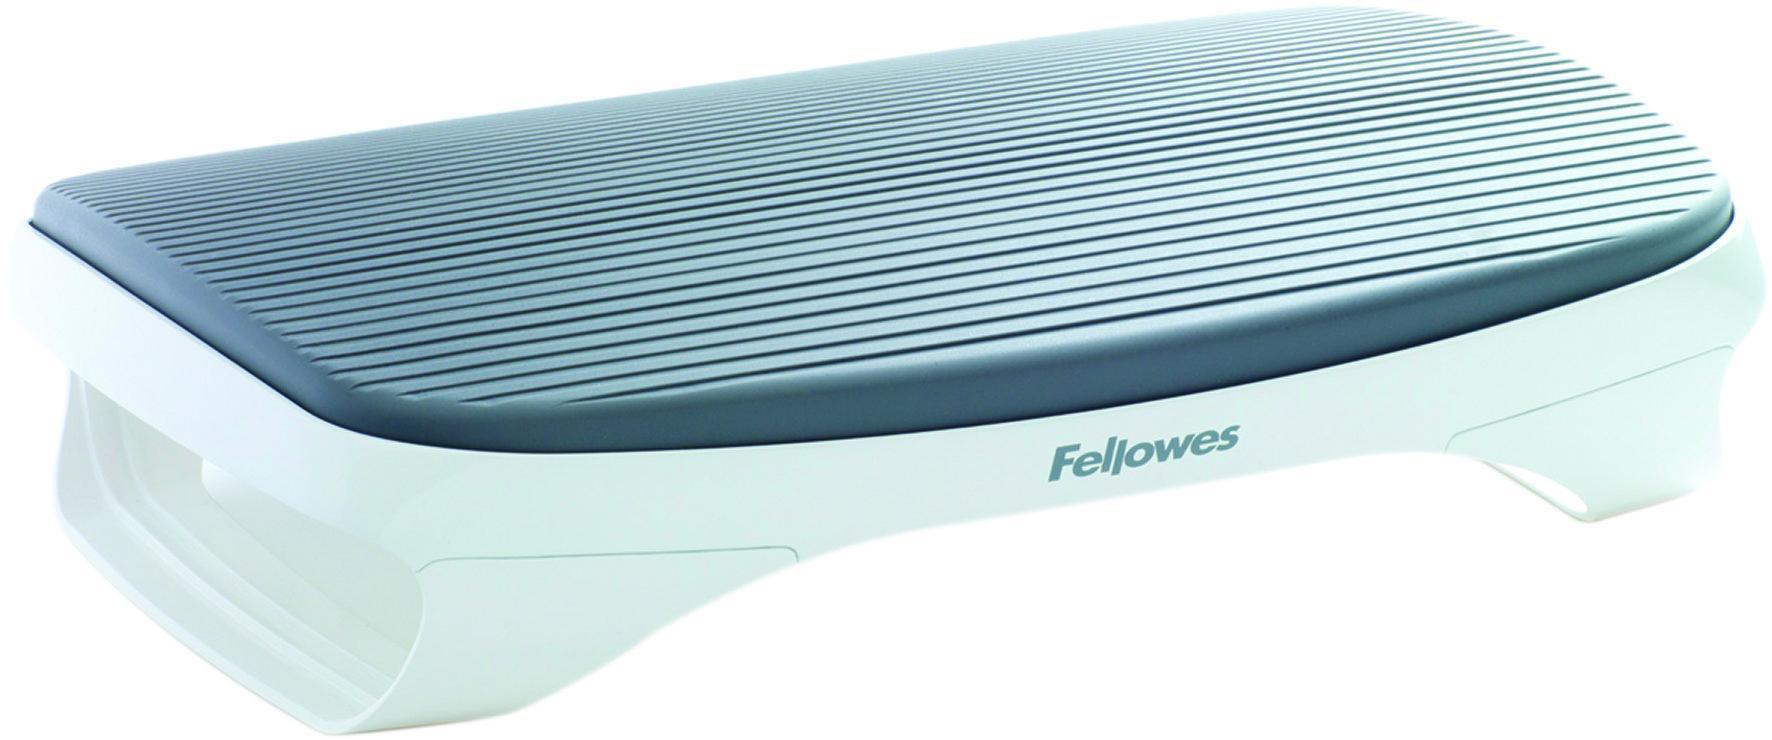 Fellowes 9361701 - Grau - Weiß - Kunststoff - 450 mm - 285 mm - 110 mm